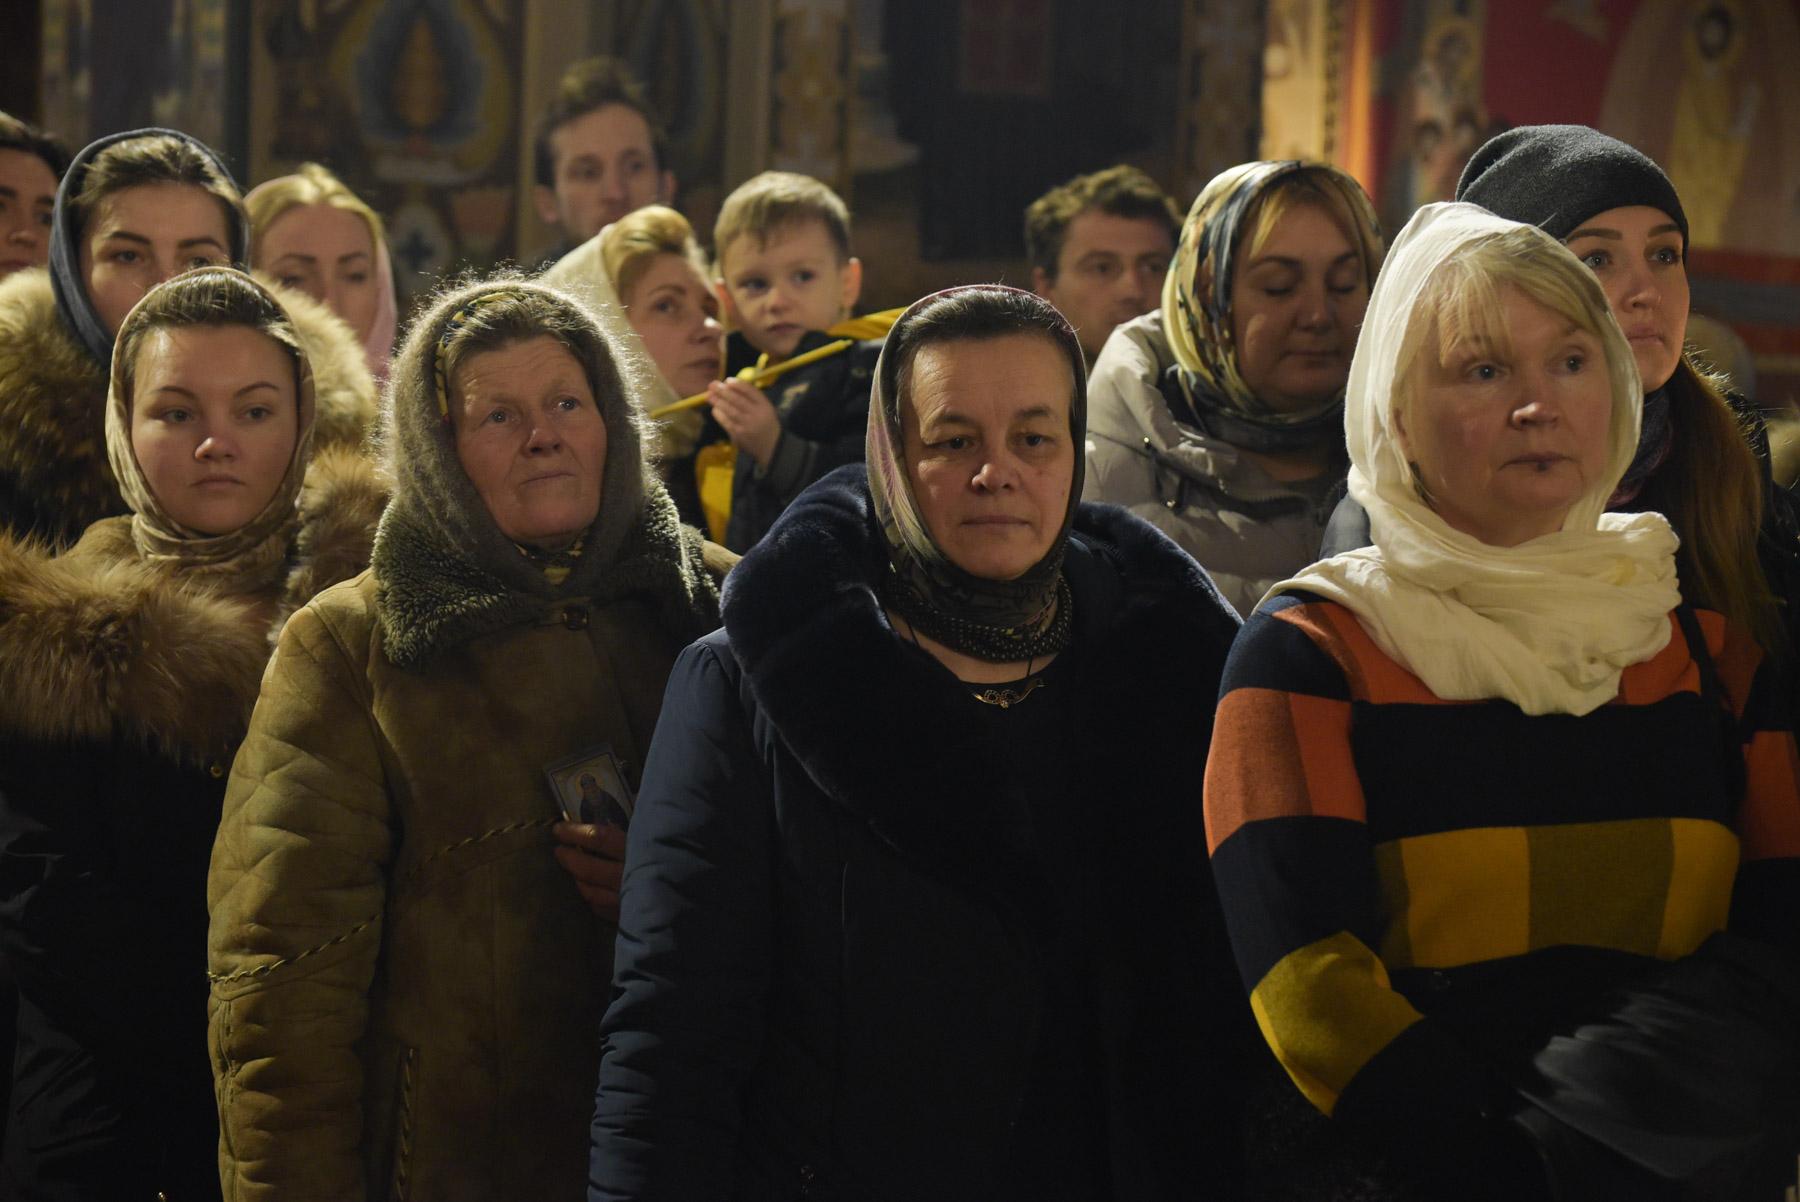 photos of orthodox christmas 0037 2